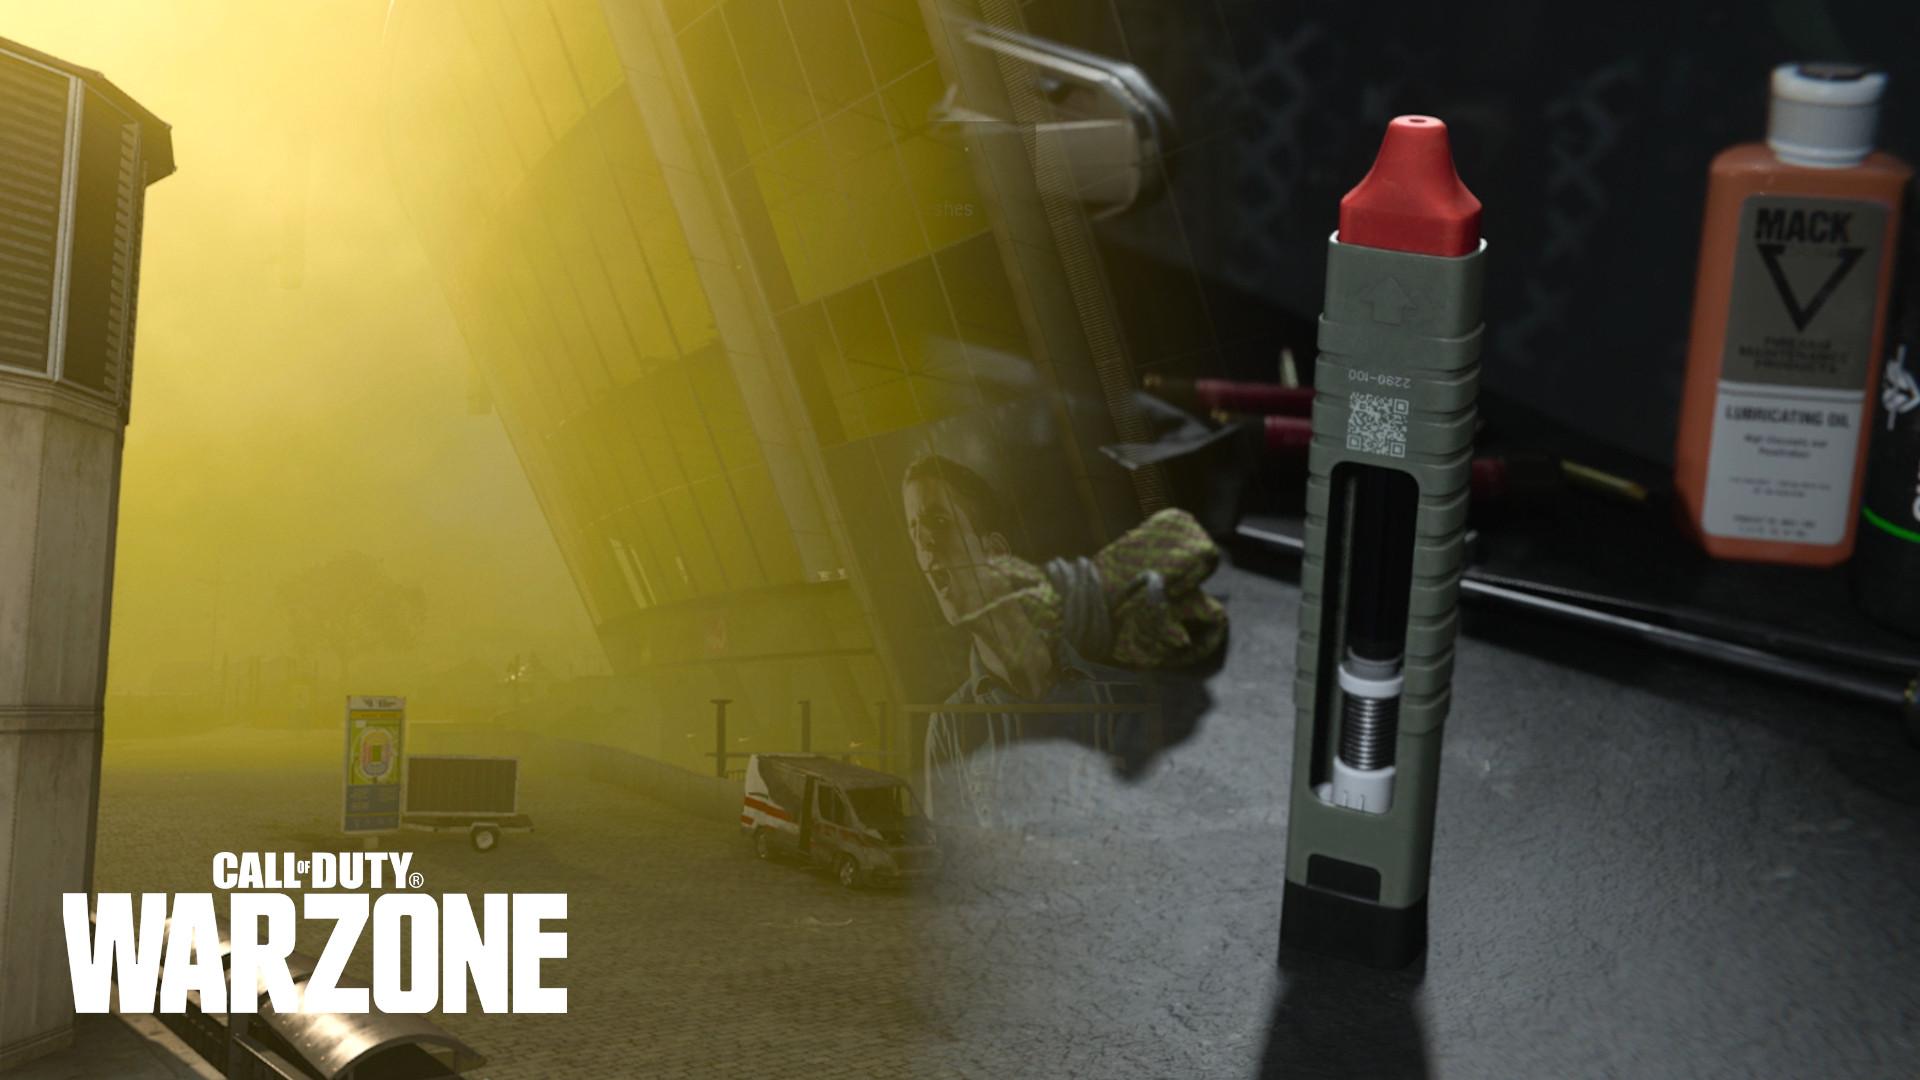 warzone unlimited stim glitch